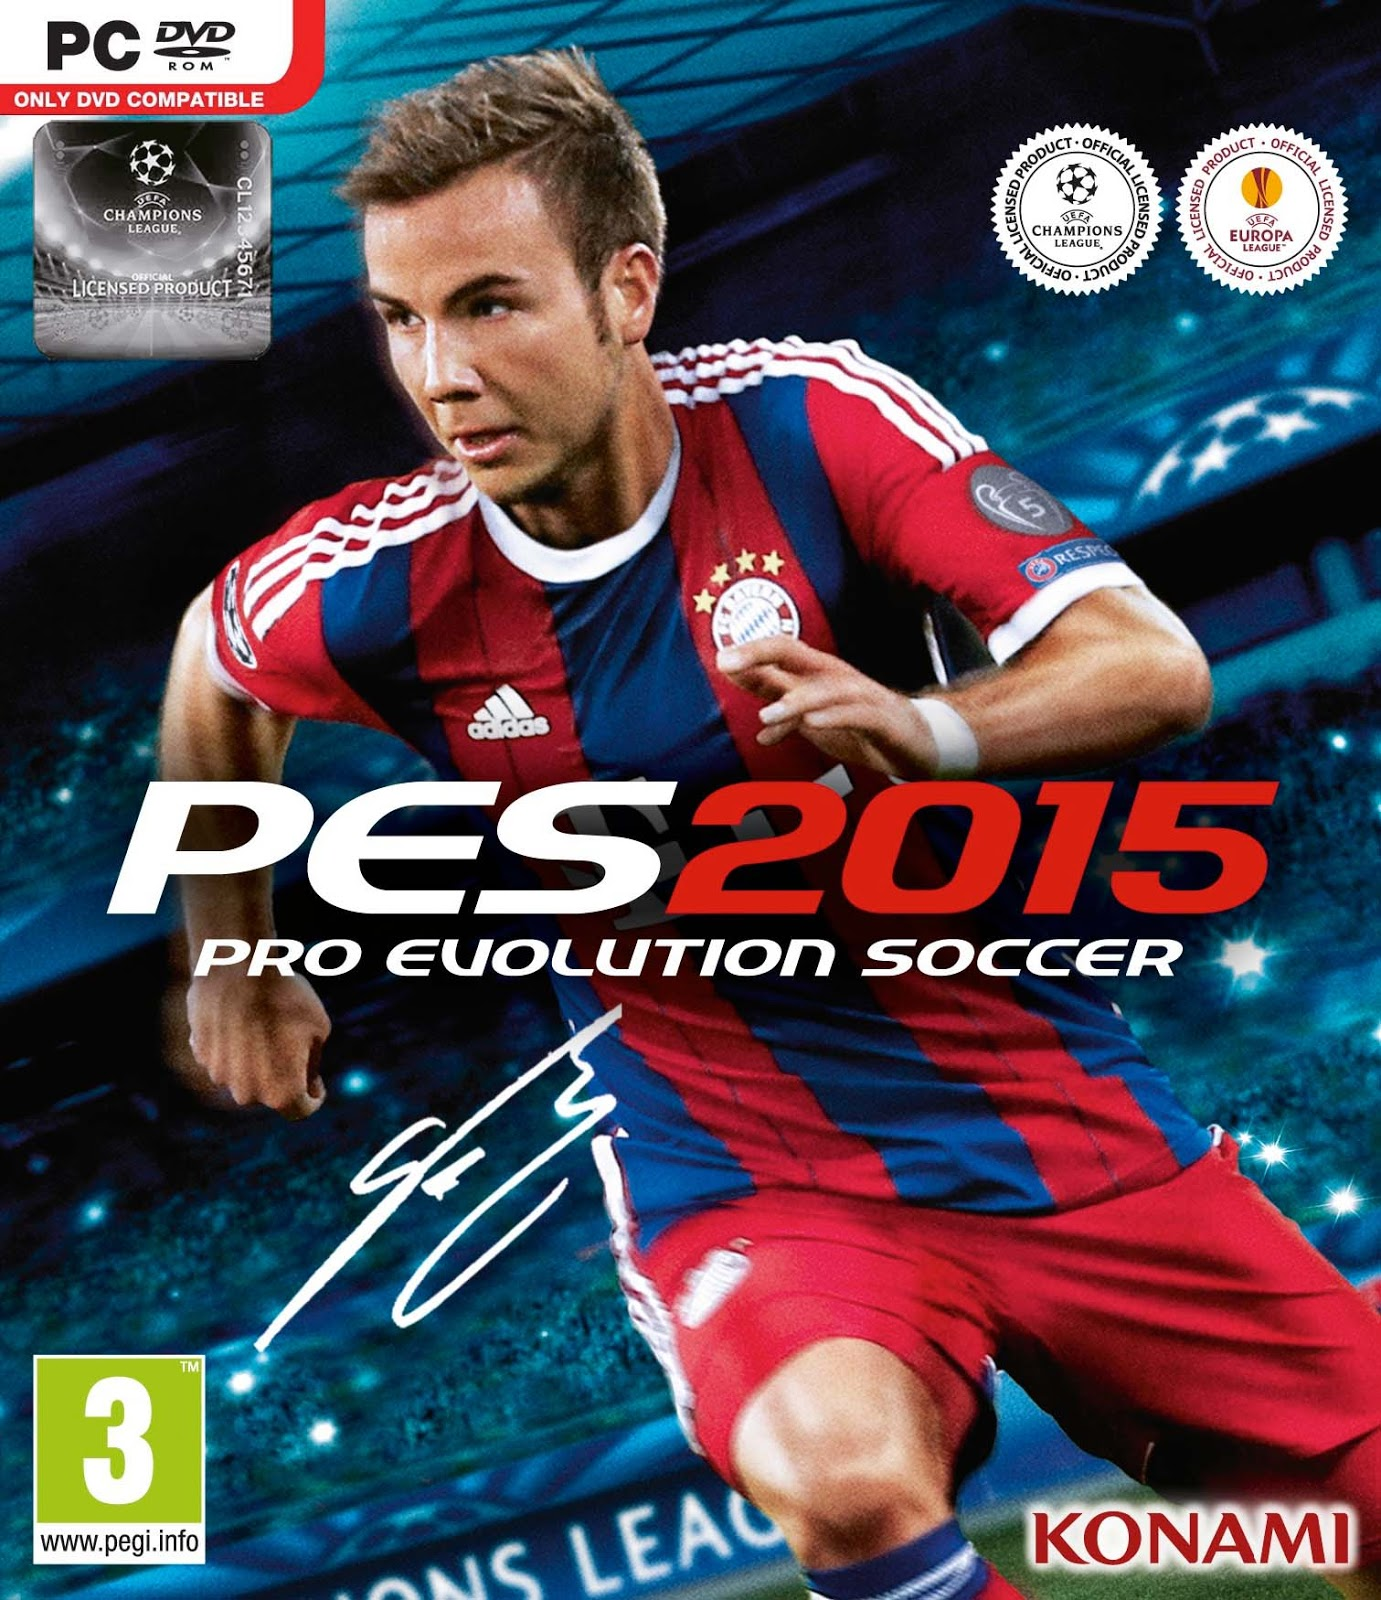 PES_2015_PC_Packshot - Copy